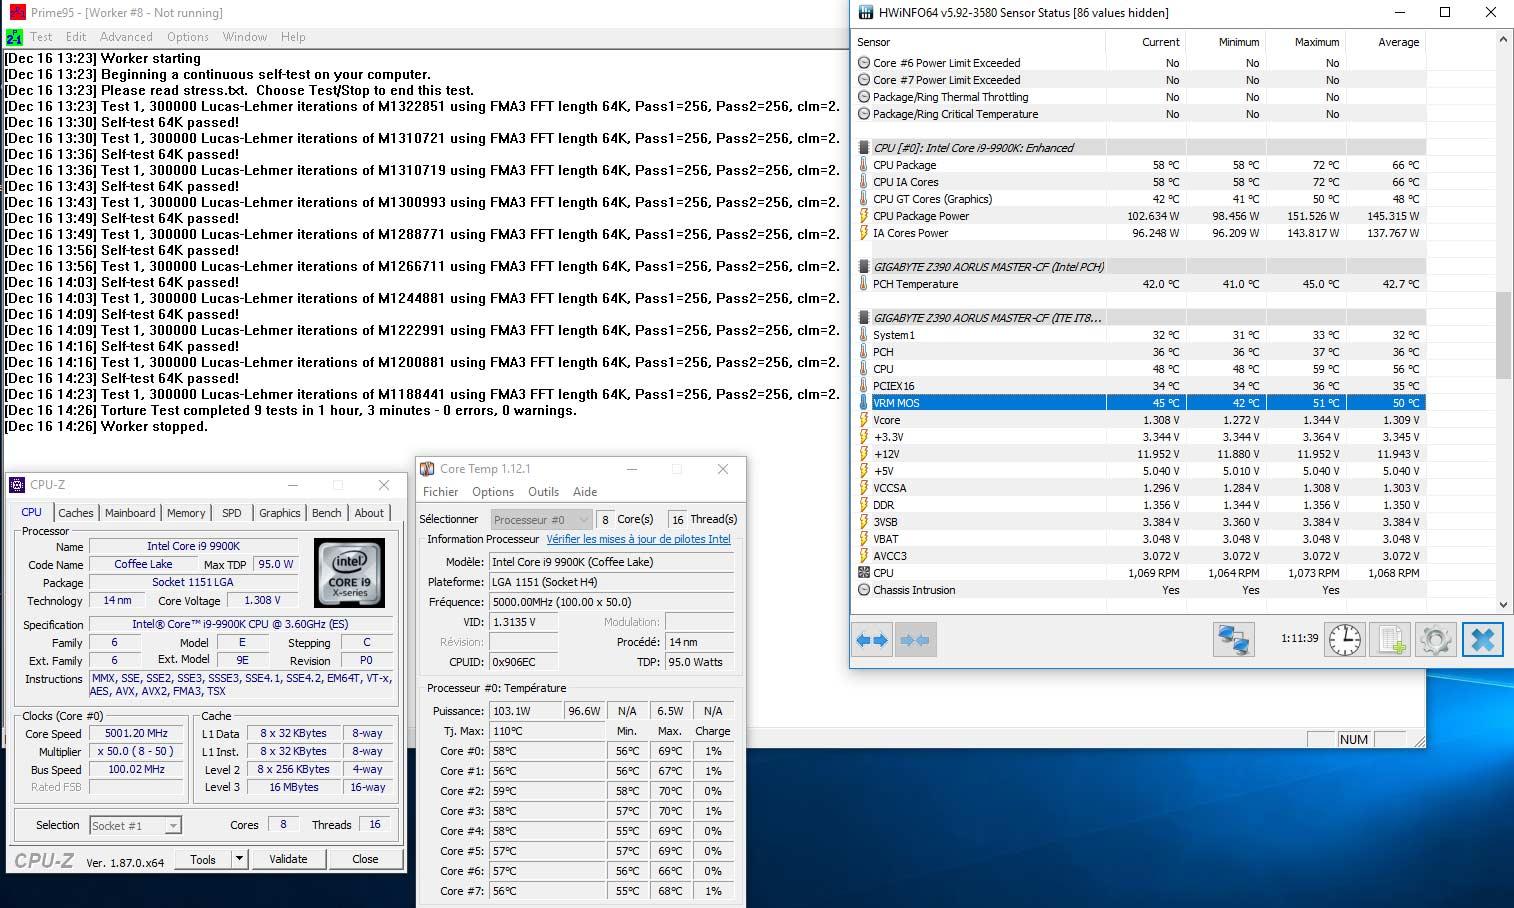 Z390 AORUS MASTER & Intel Core i9-9900K à 5 GHz